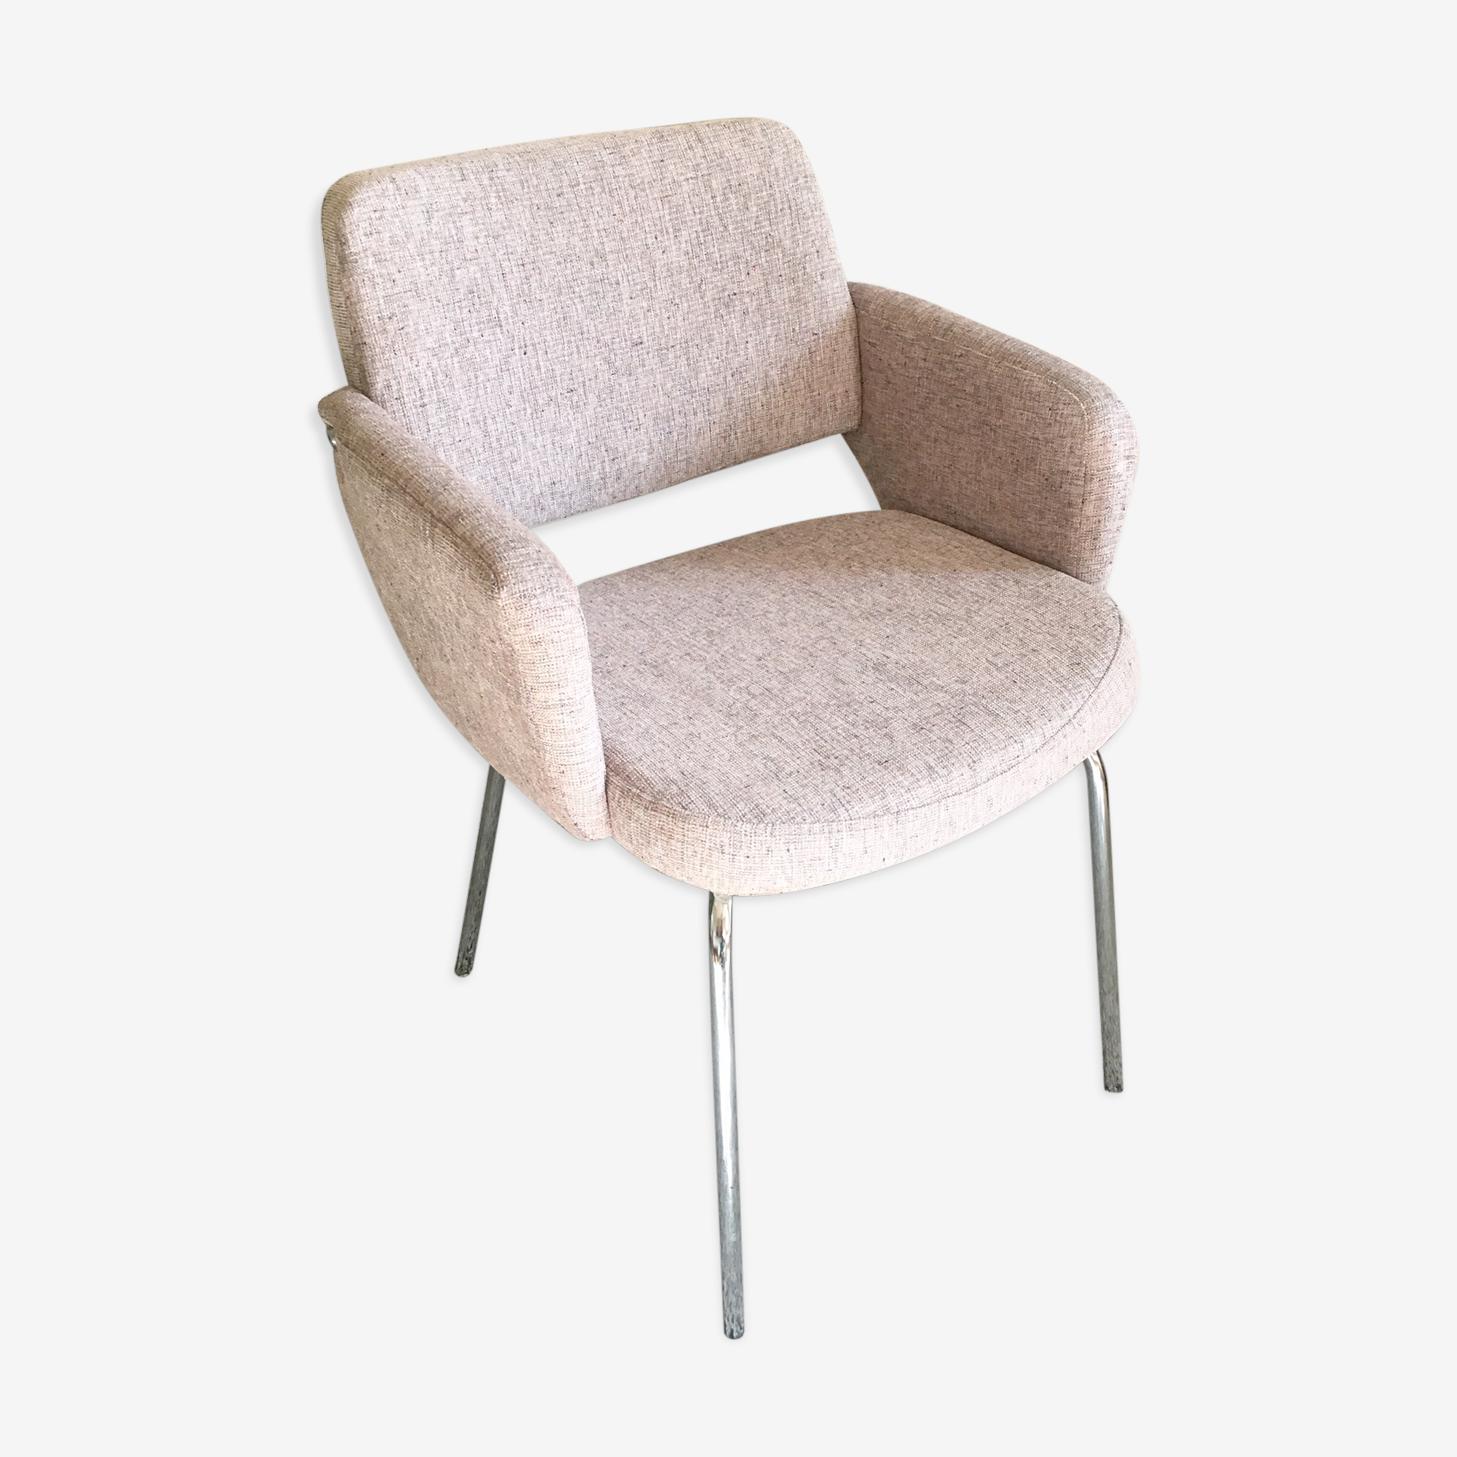 Restored vintage pink armchair